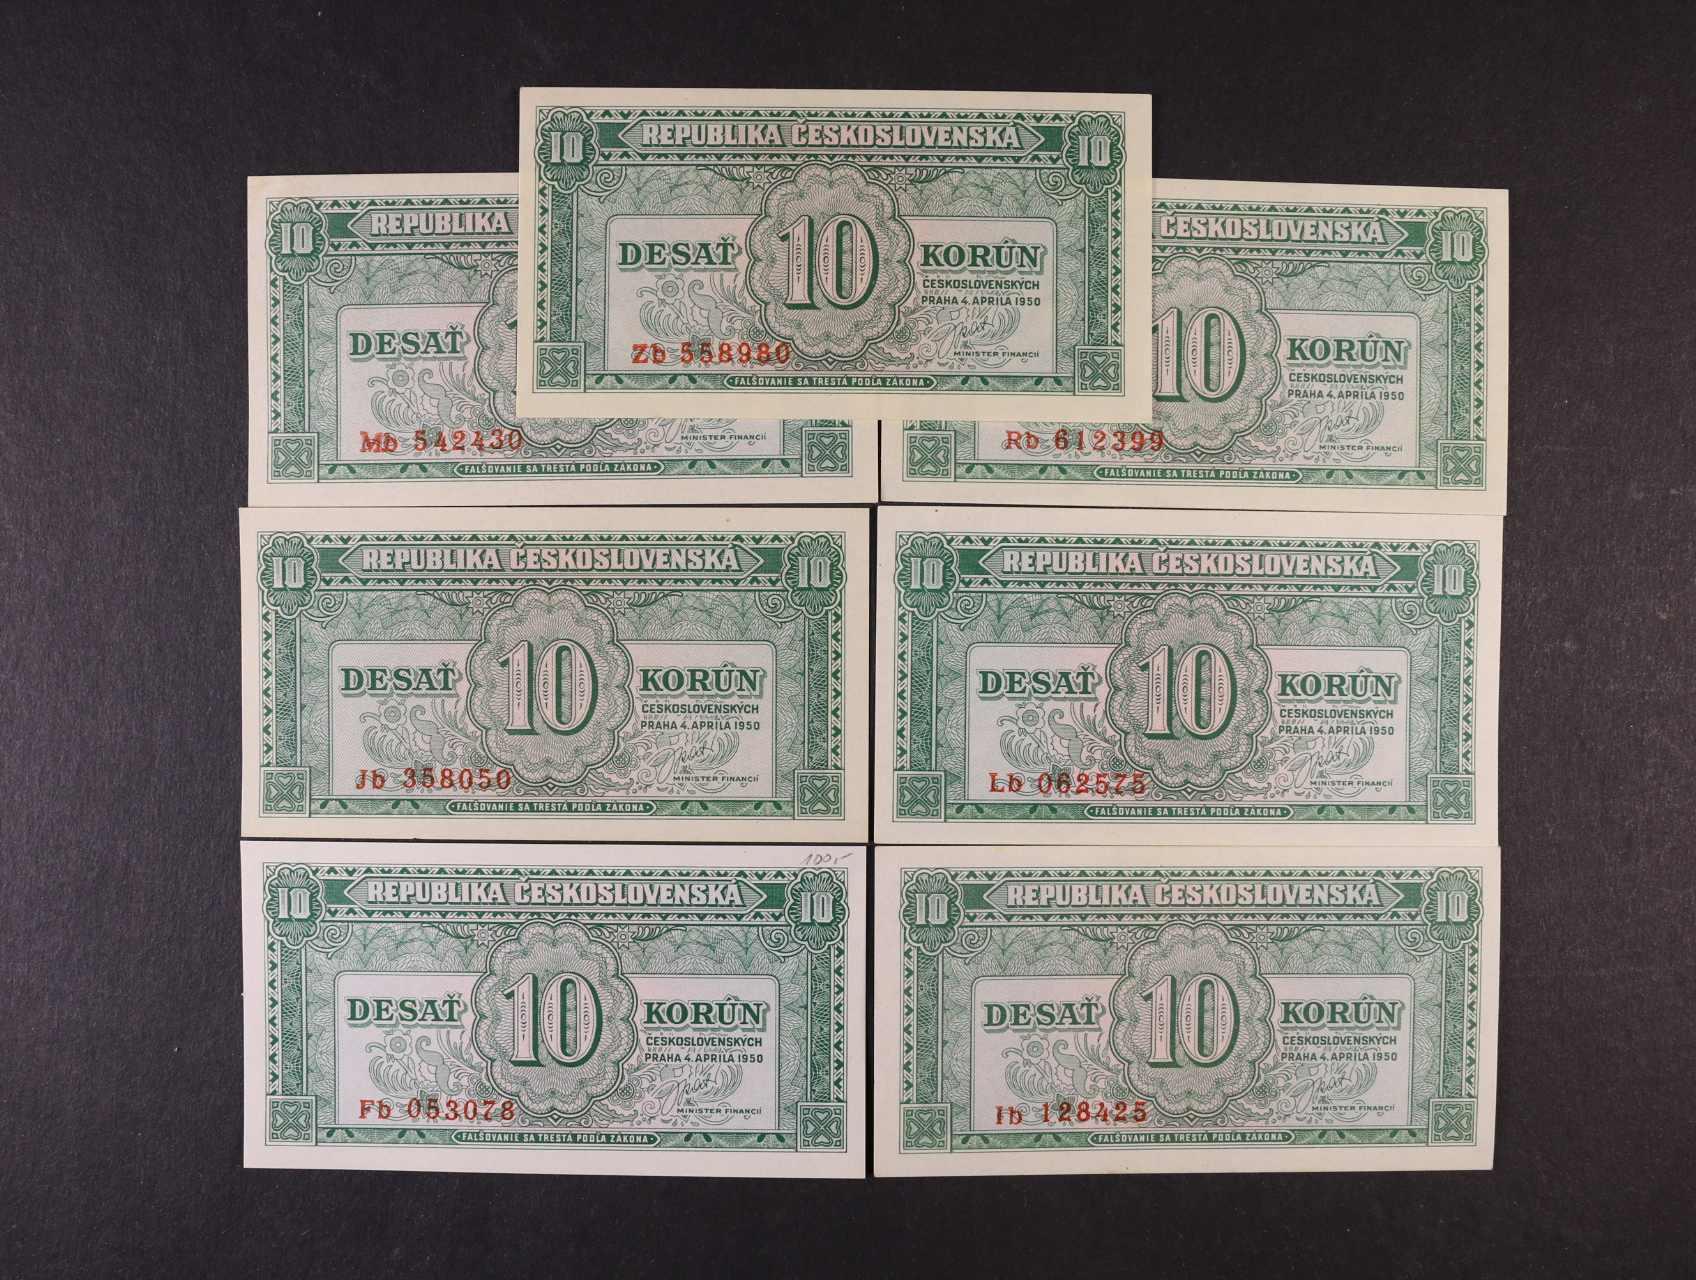 10 Kčs 4.4.1950 série Fb, Ib, Jb, Lb, Mb, Rb, Zb, Ba. 84b, Pi. 69a, 7ks